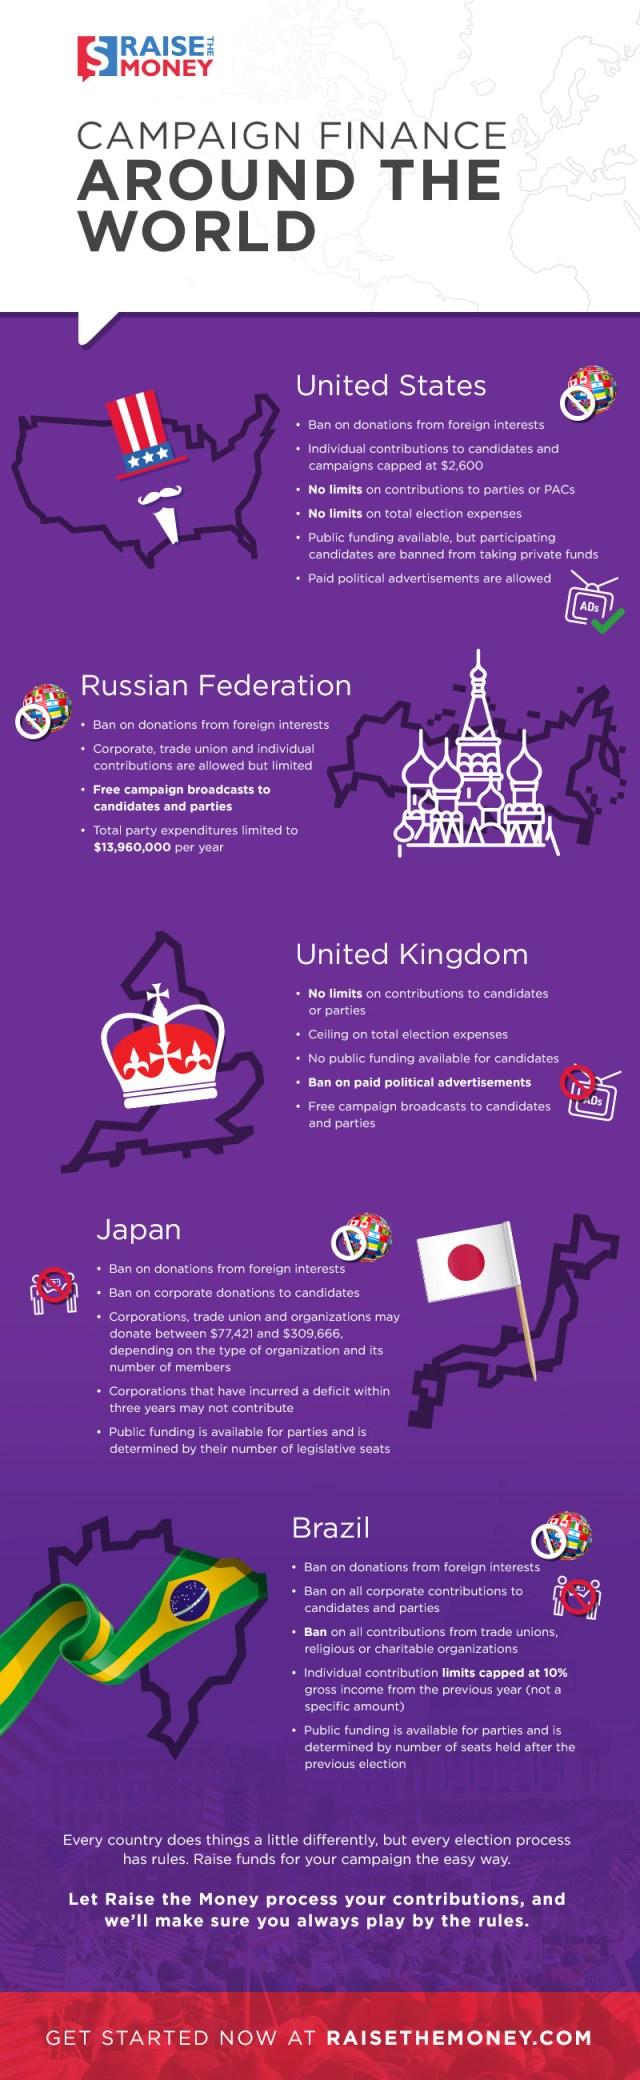 rtm_infographic_campaign-finance_v2-2.jpg